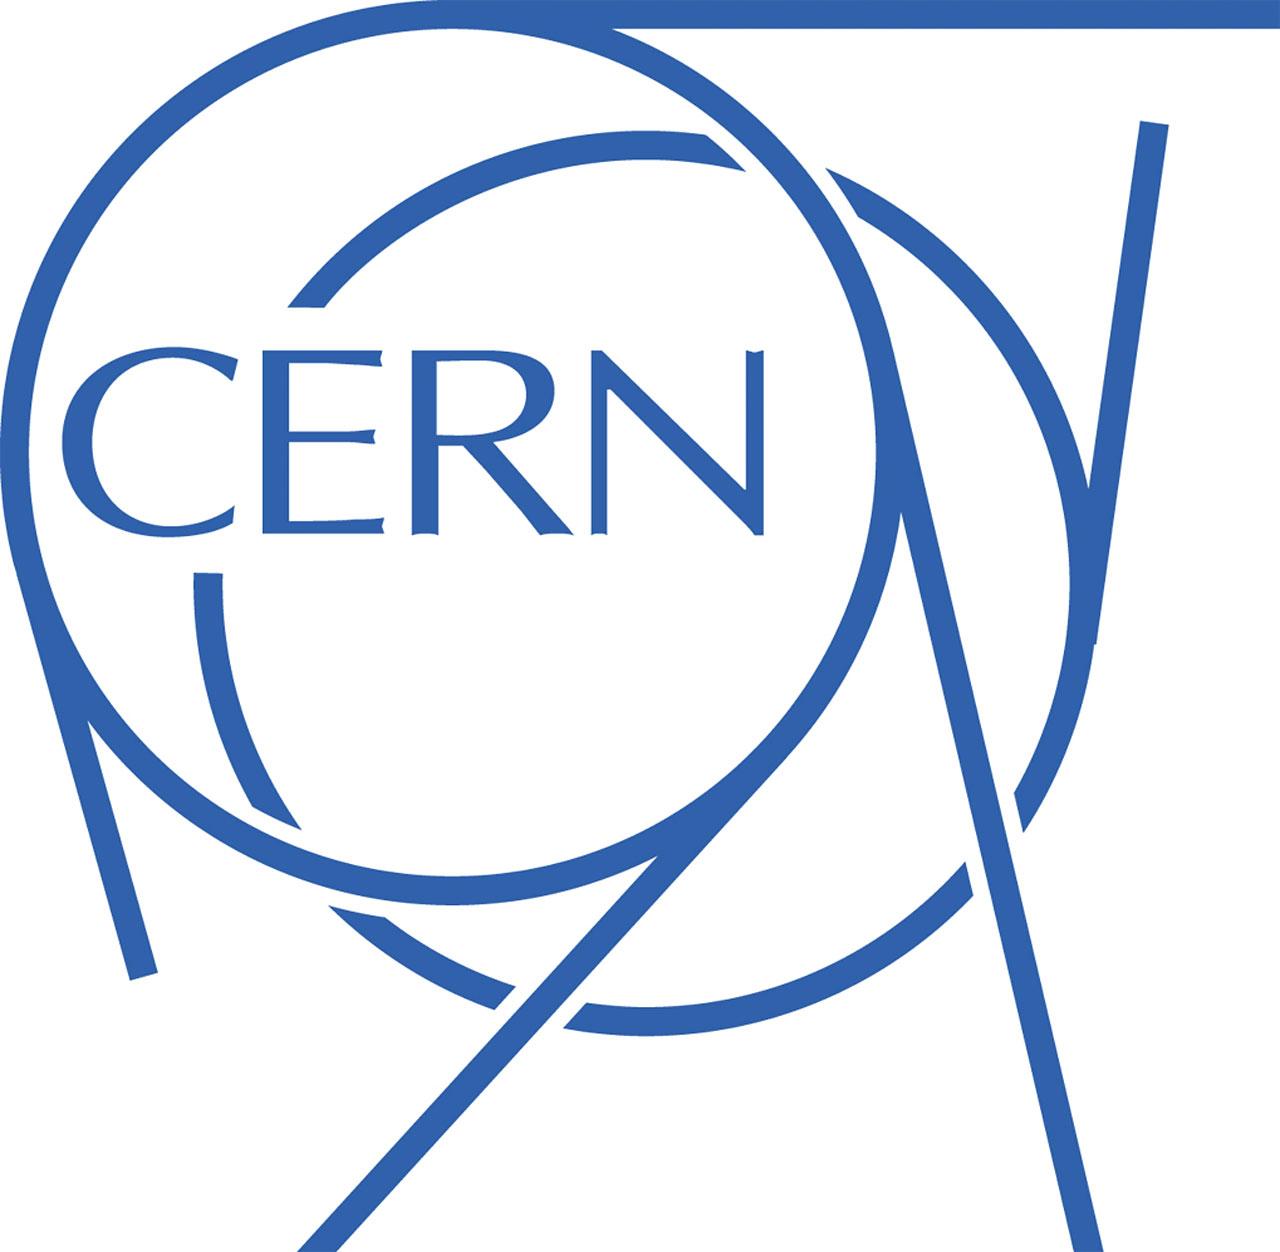 Free 2 hour tour of CERN (Large Hadron Collider) - Located at Geneva, Switzerland